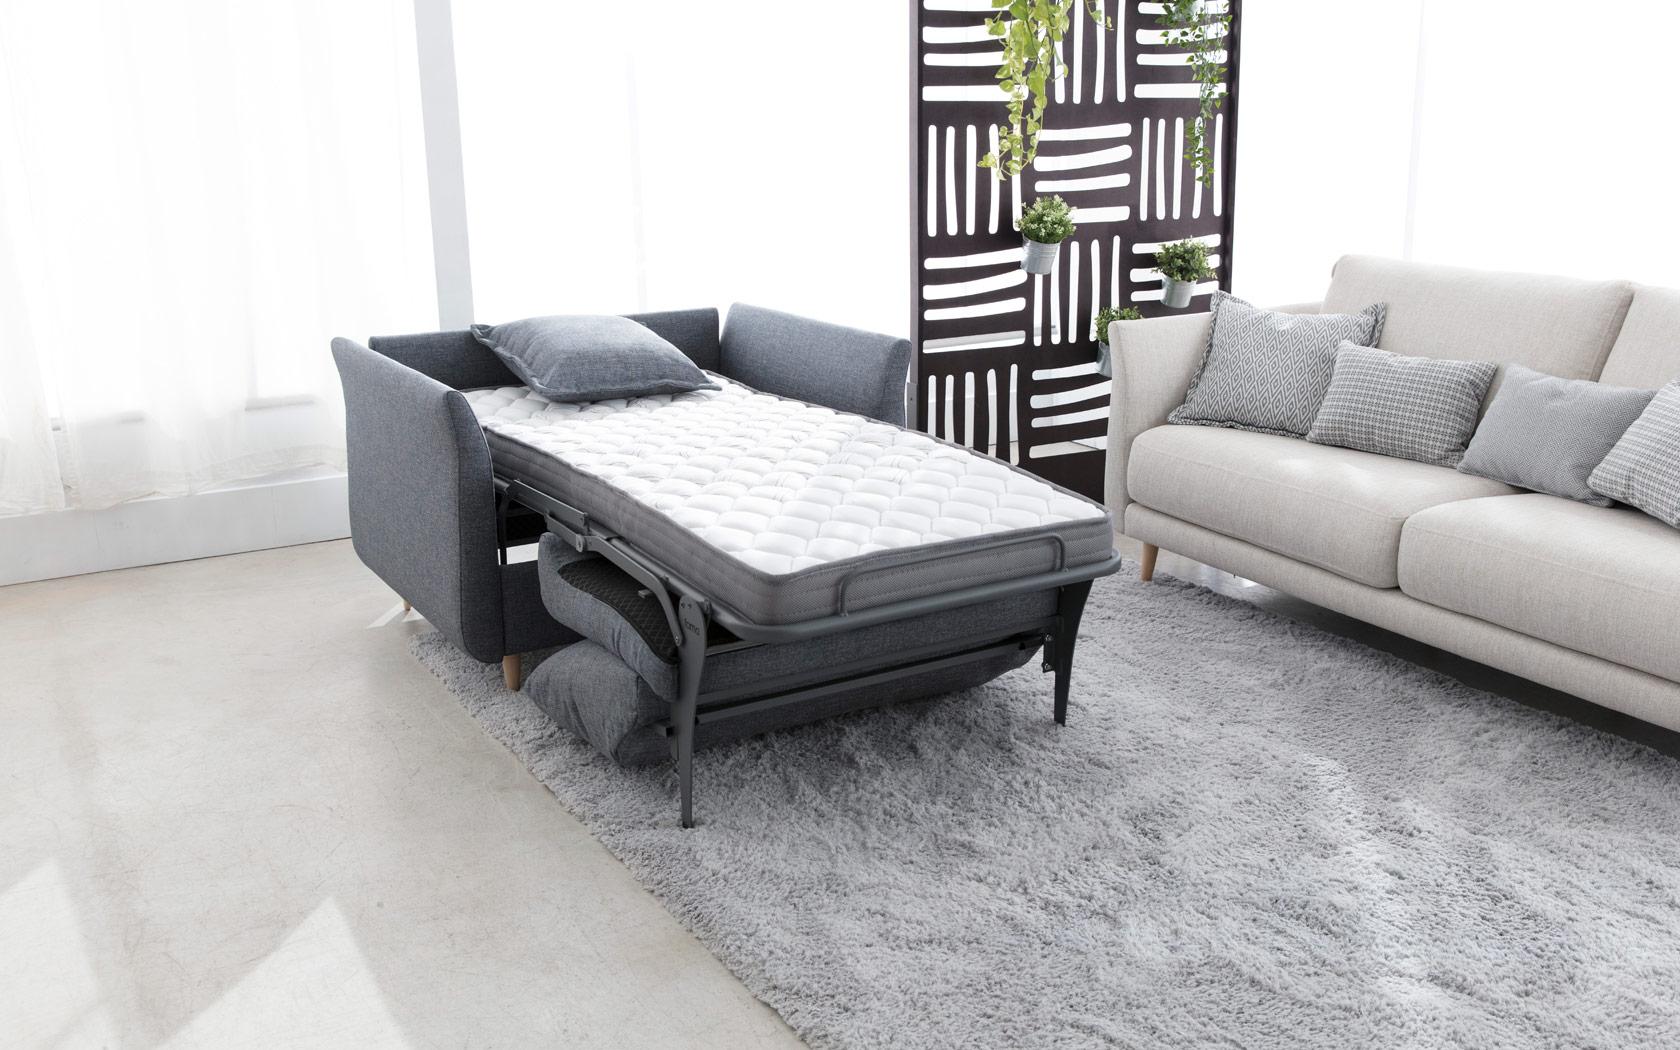 Helsinki sillón cama 2020 01